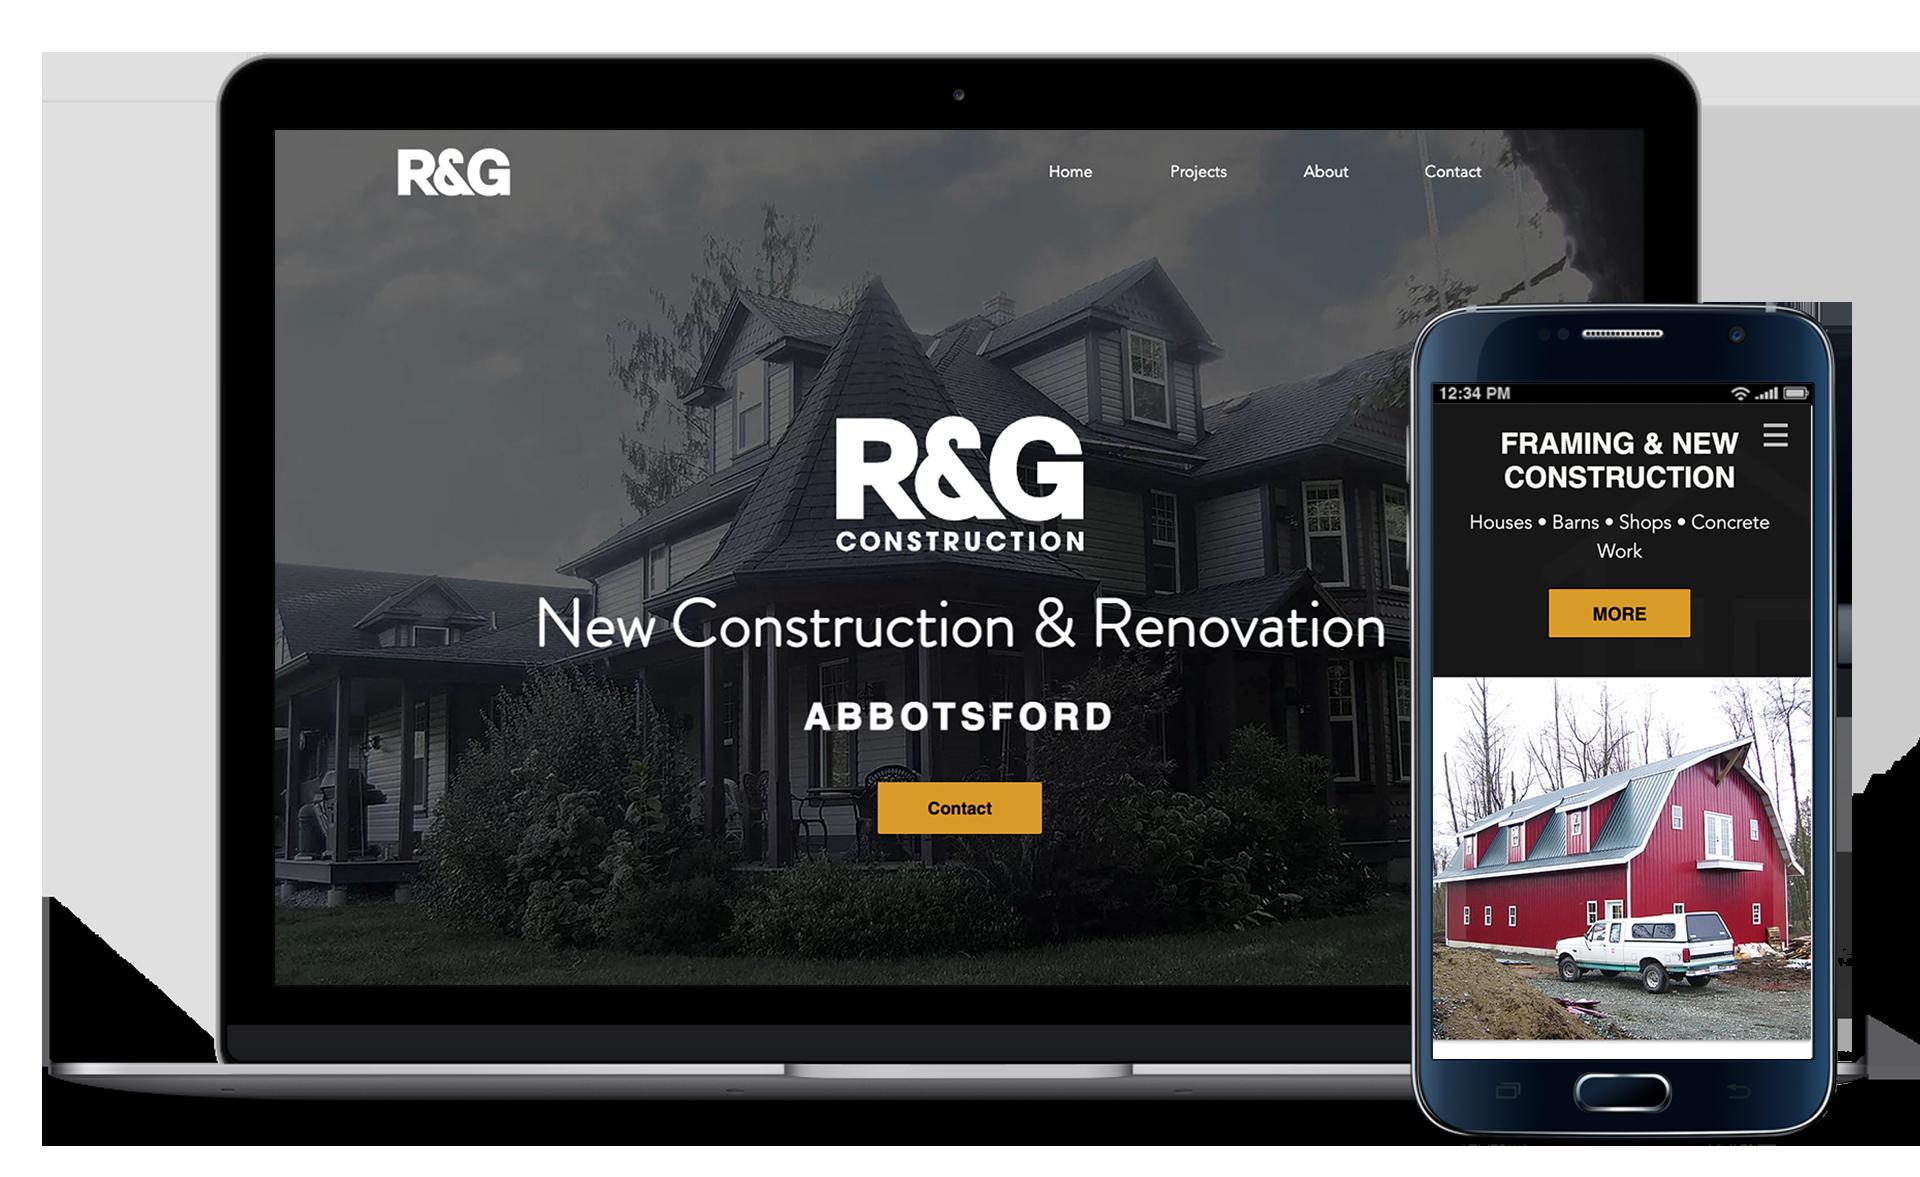 R&G-Construction-Website-Laptop